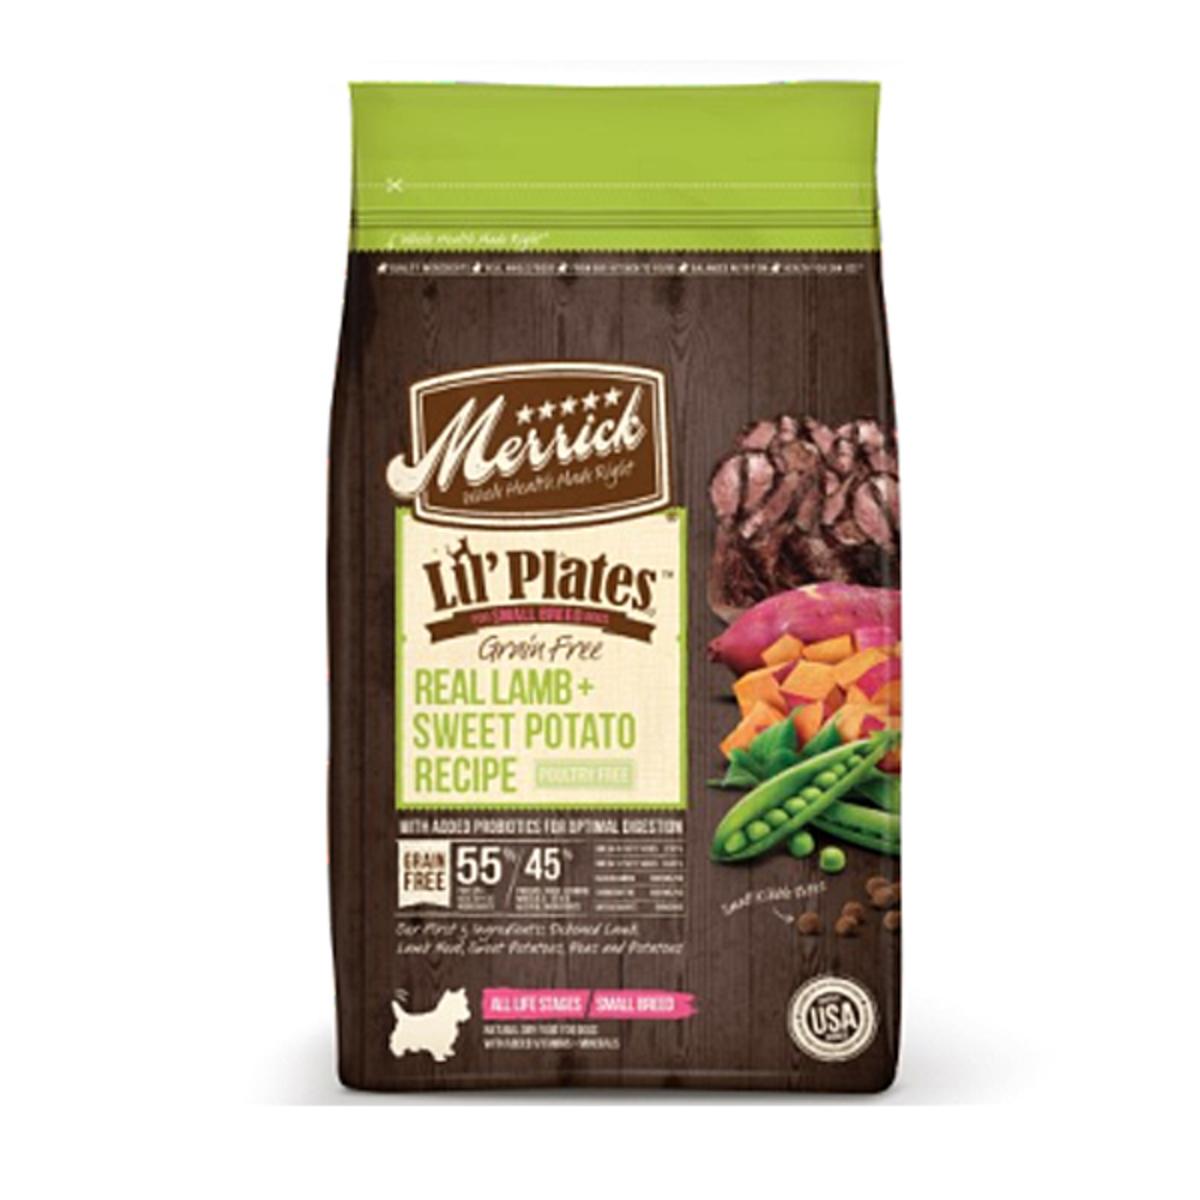 Lil'Plates Grain Free Real Lamb + Sweet Potato Recipe - 4lb